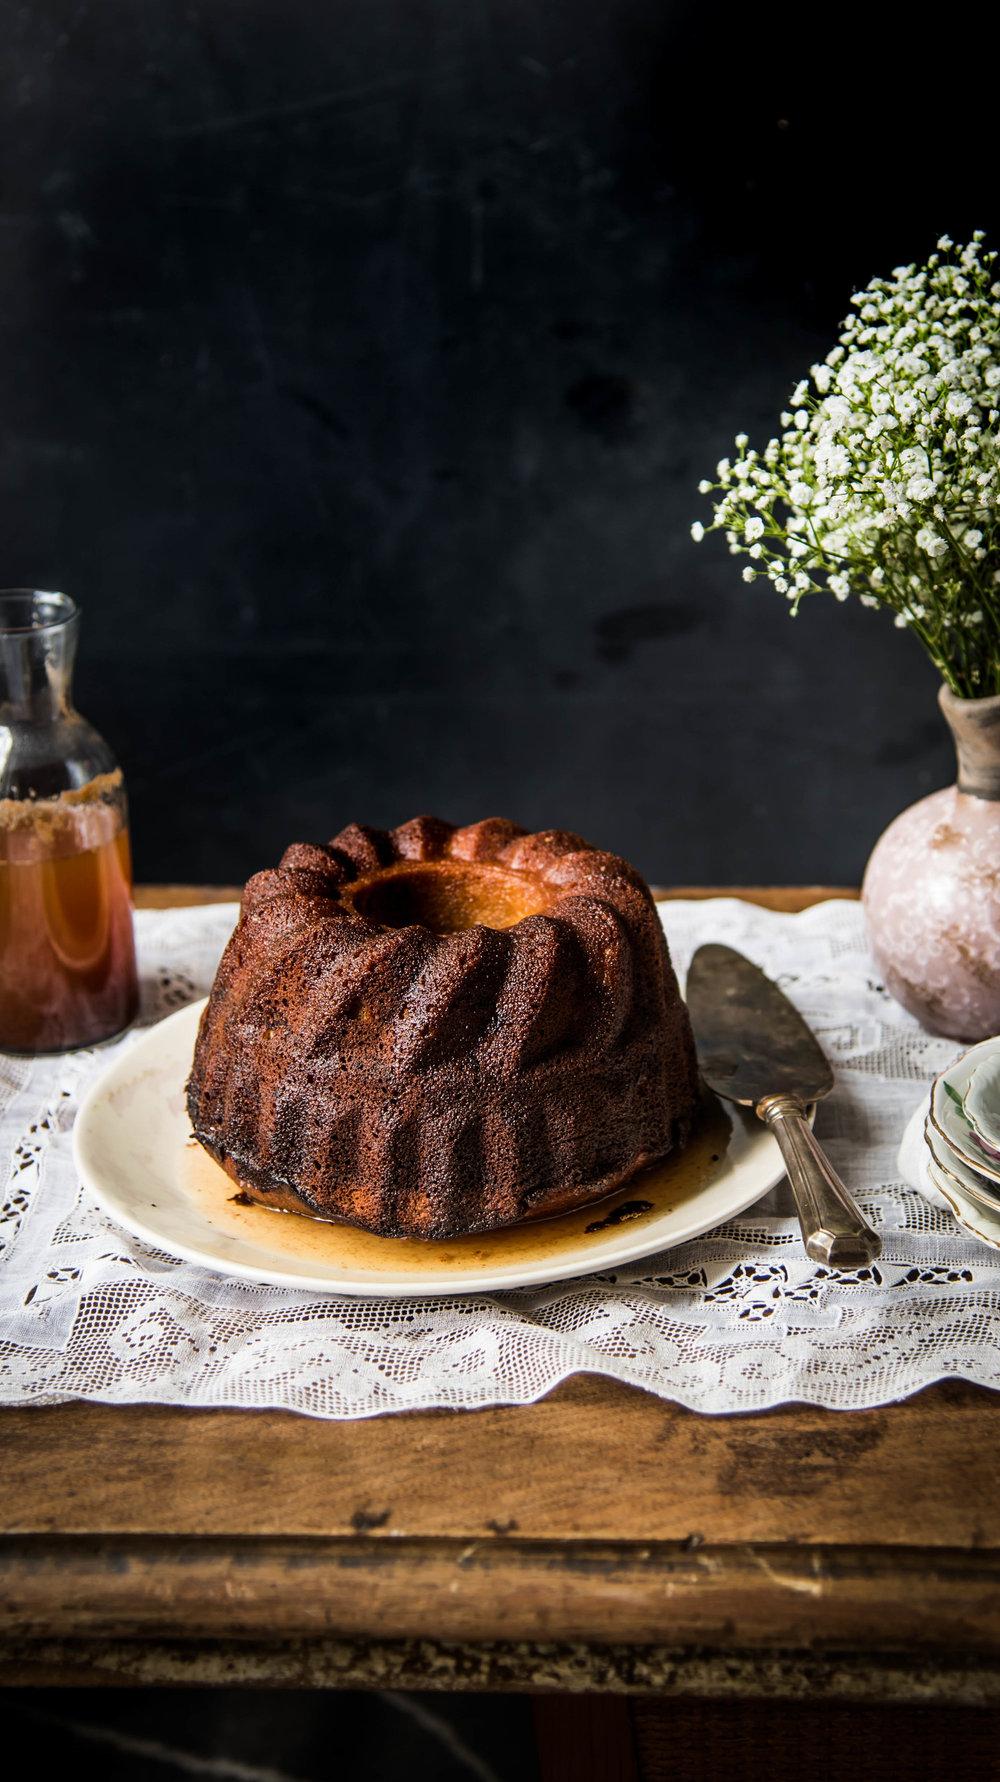 ROSE+&+IVY+Journal+Rhubarb+Olive+Oil+Cake+Gluten+Free.jpeg